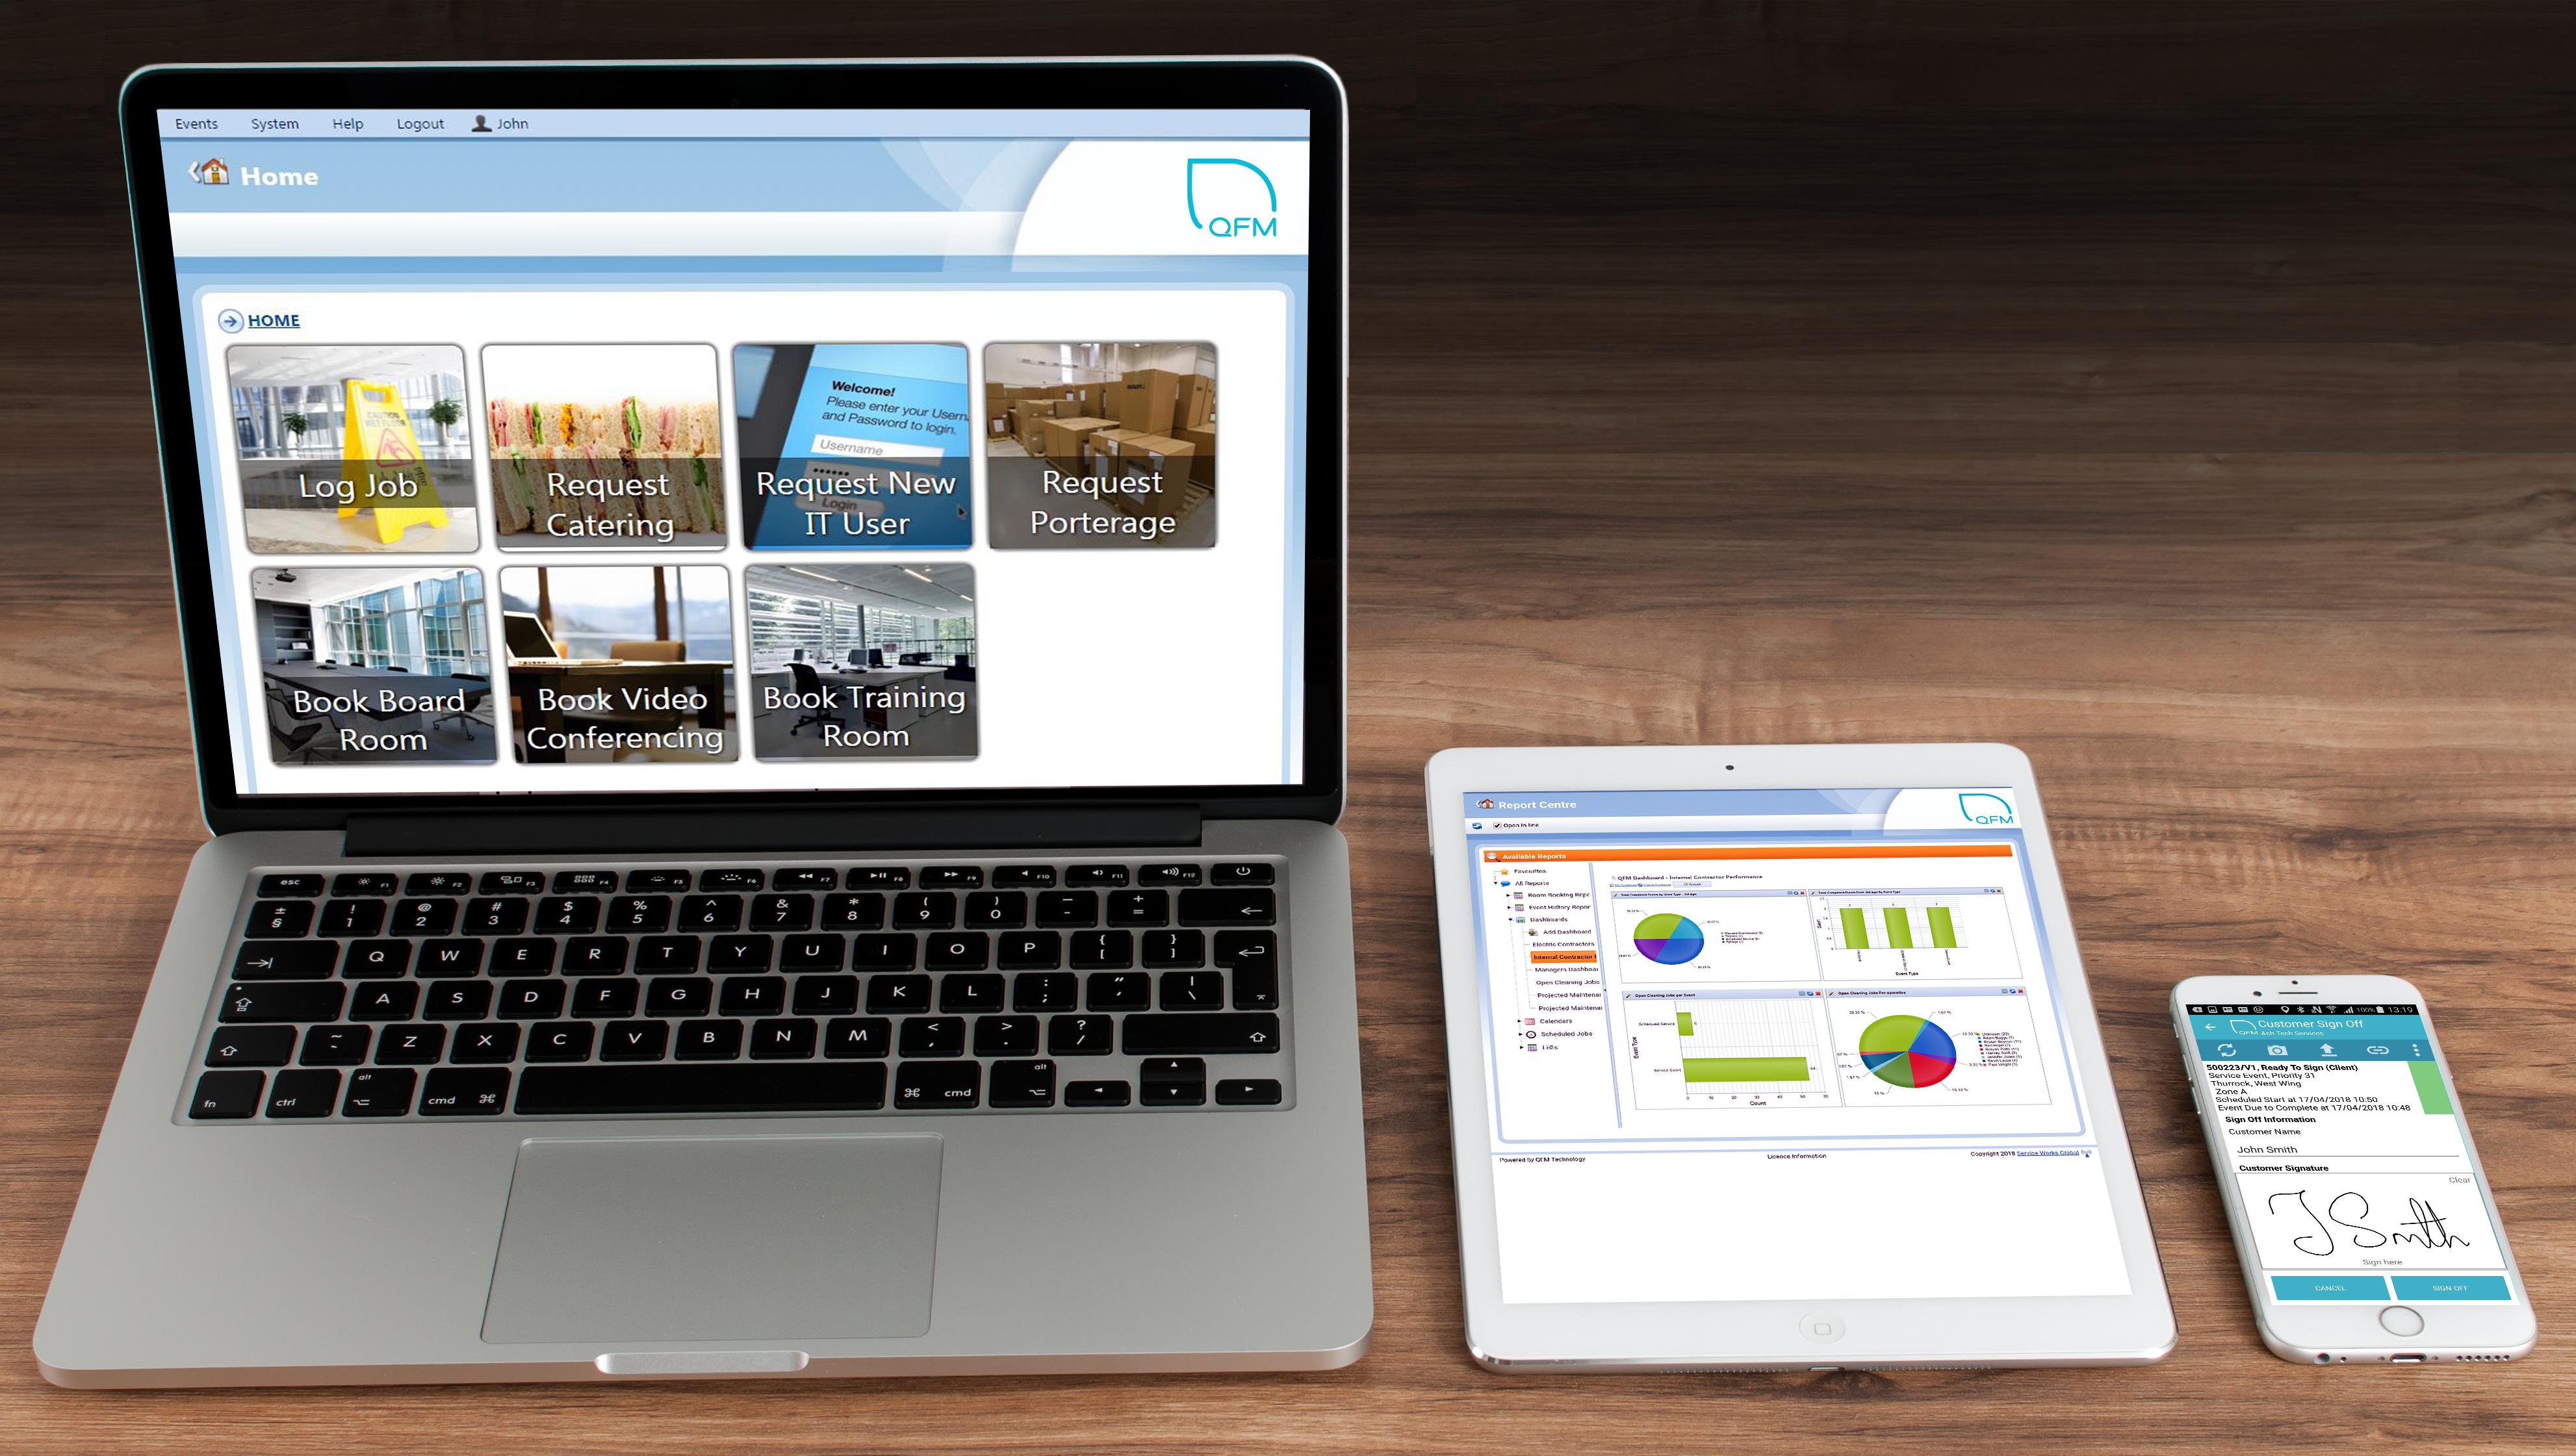 qfm-crop-laptop ipad mobile pixabay-583839-1